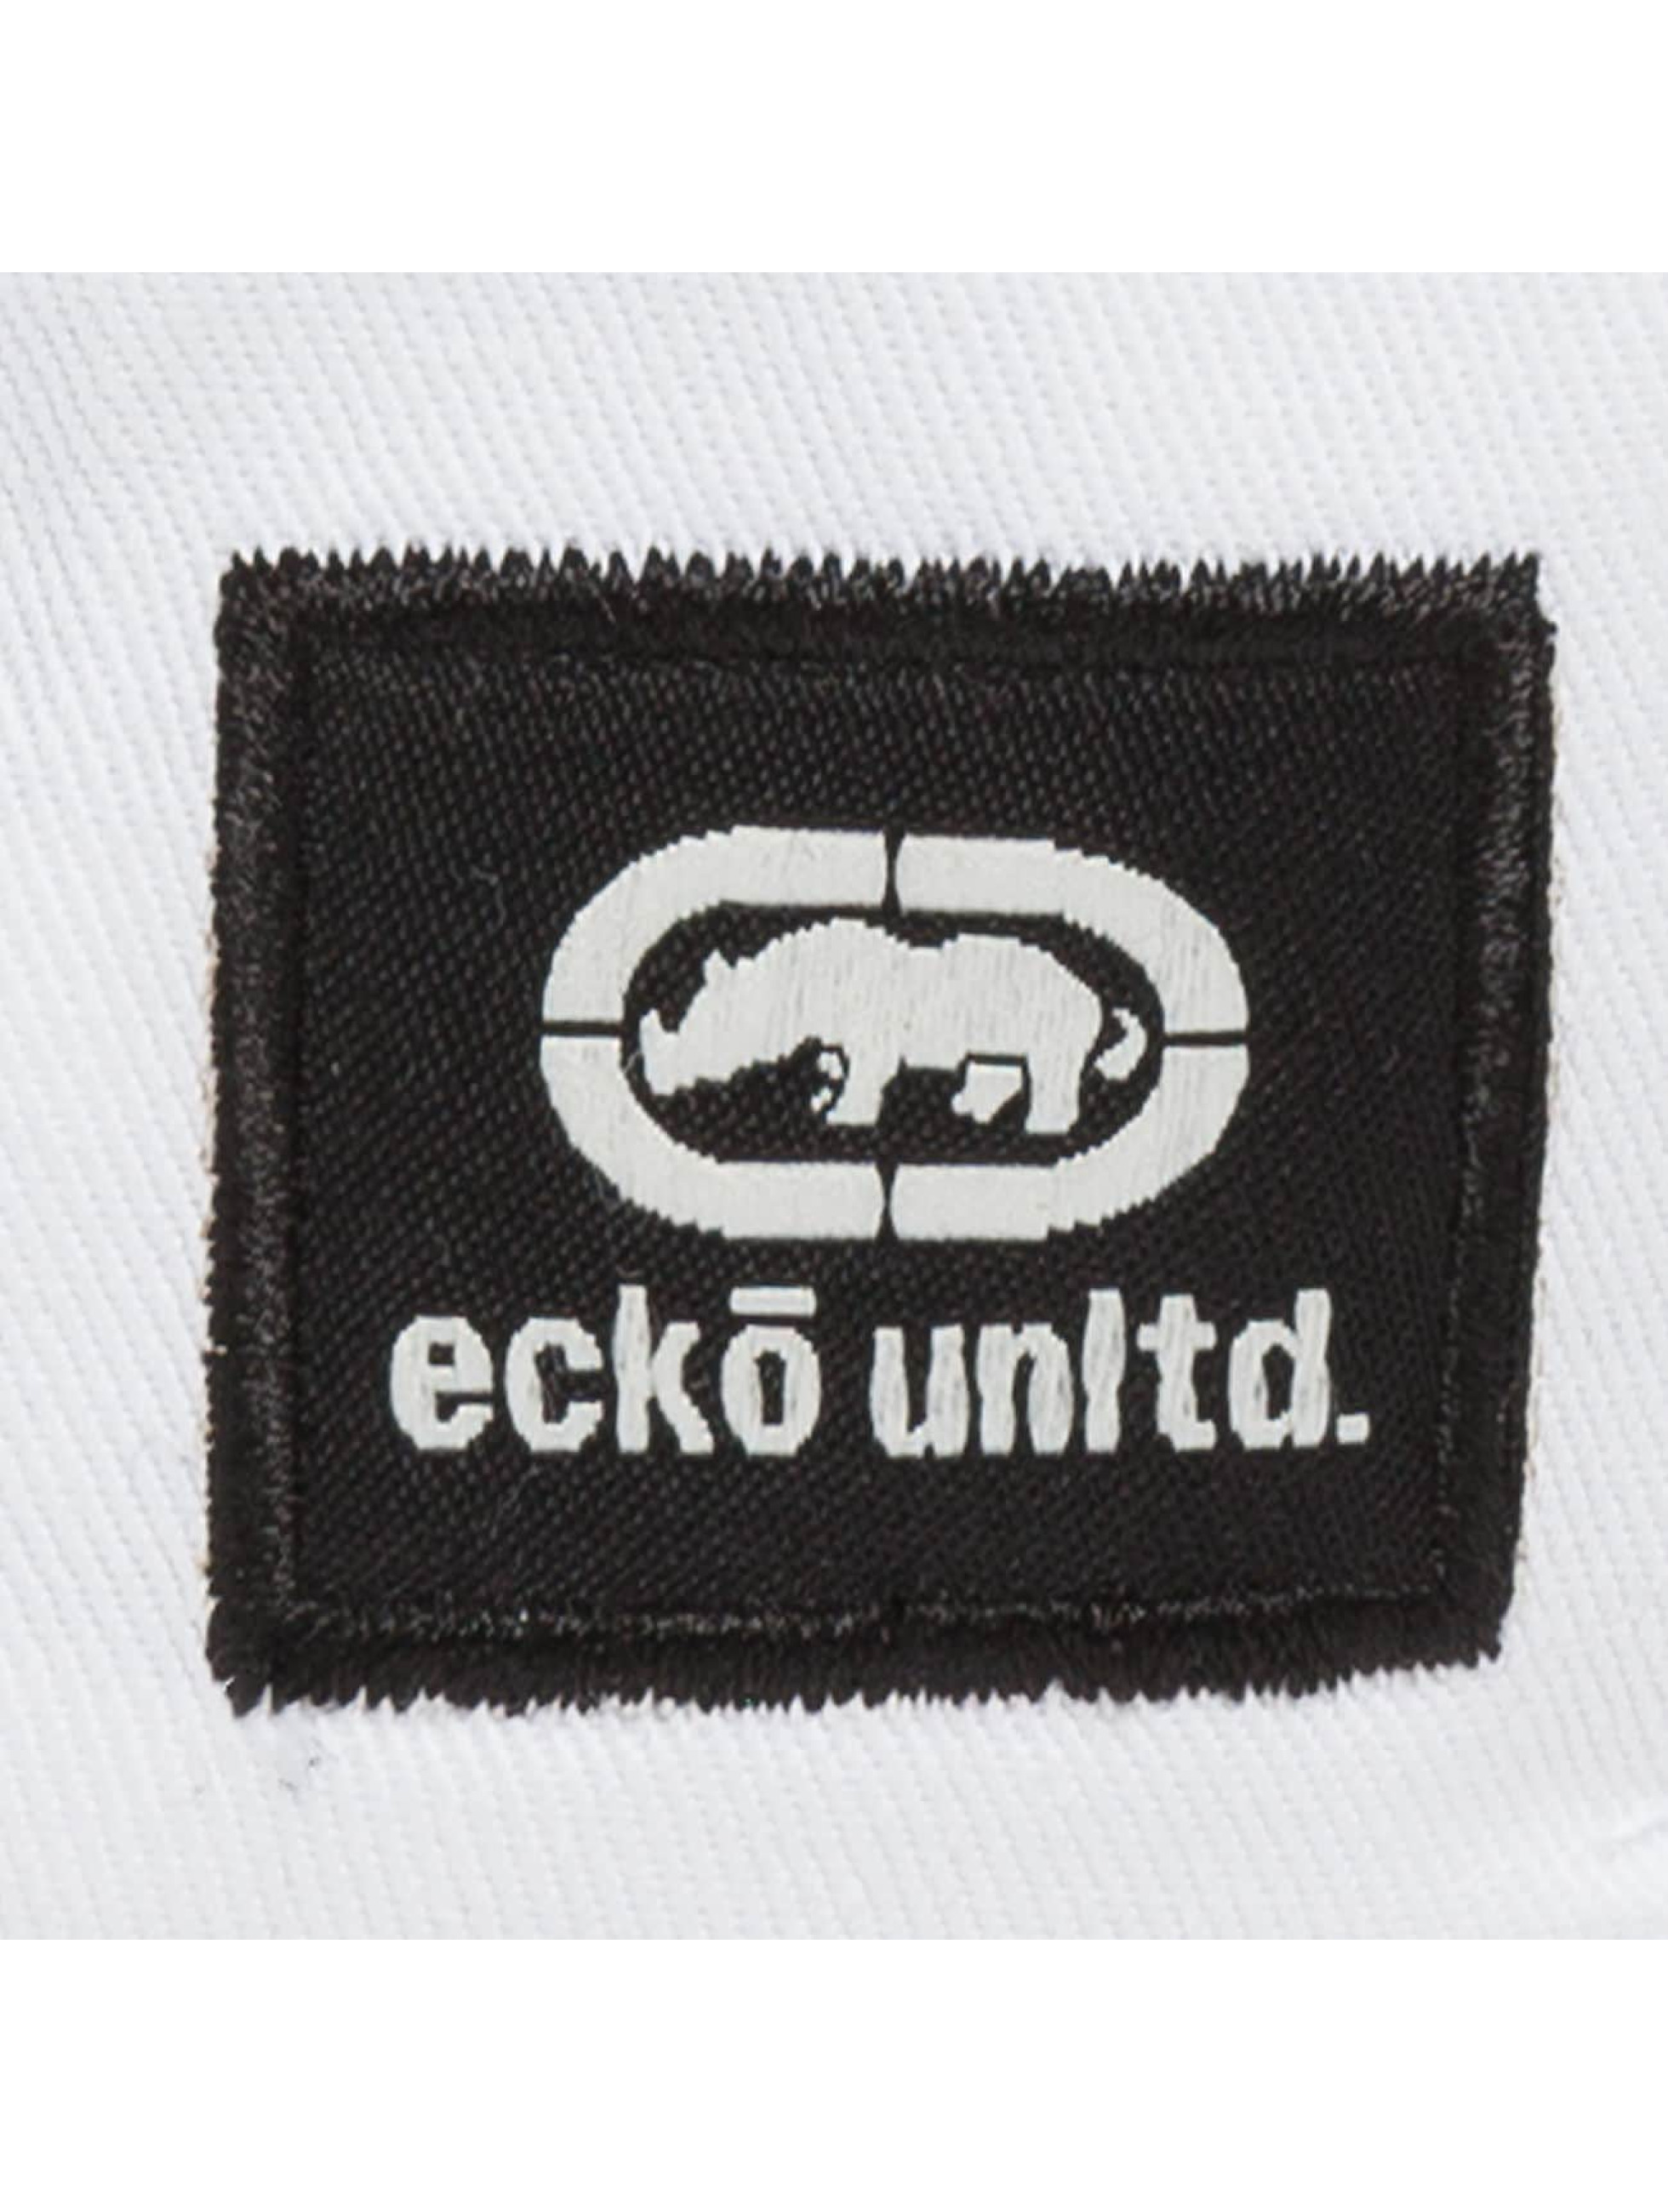 Ecko Unltd. Snapback Cap DolphinBay white